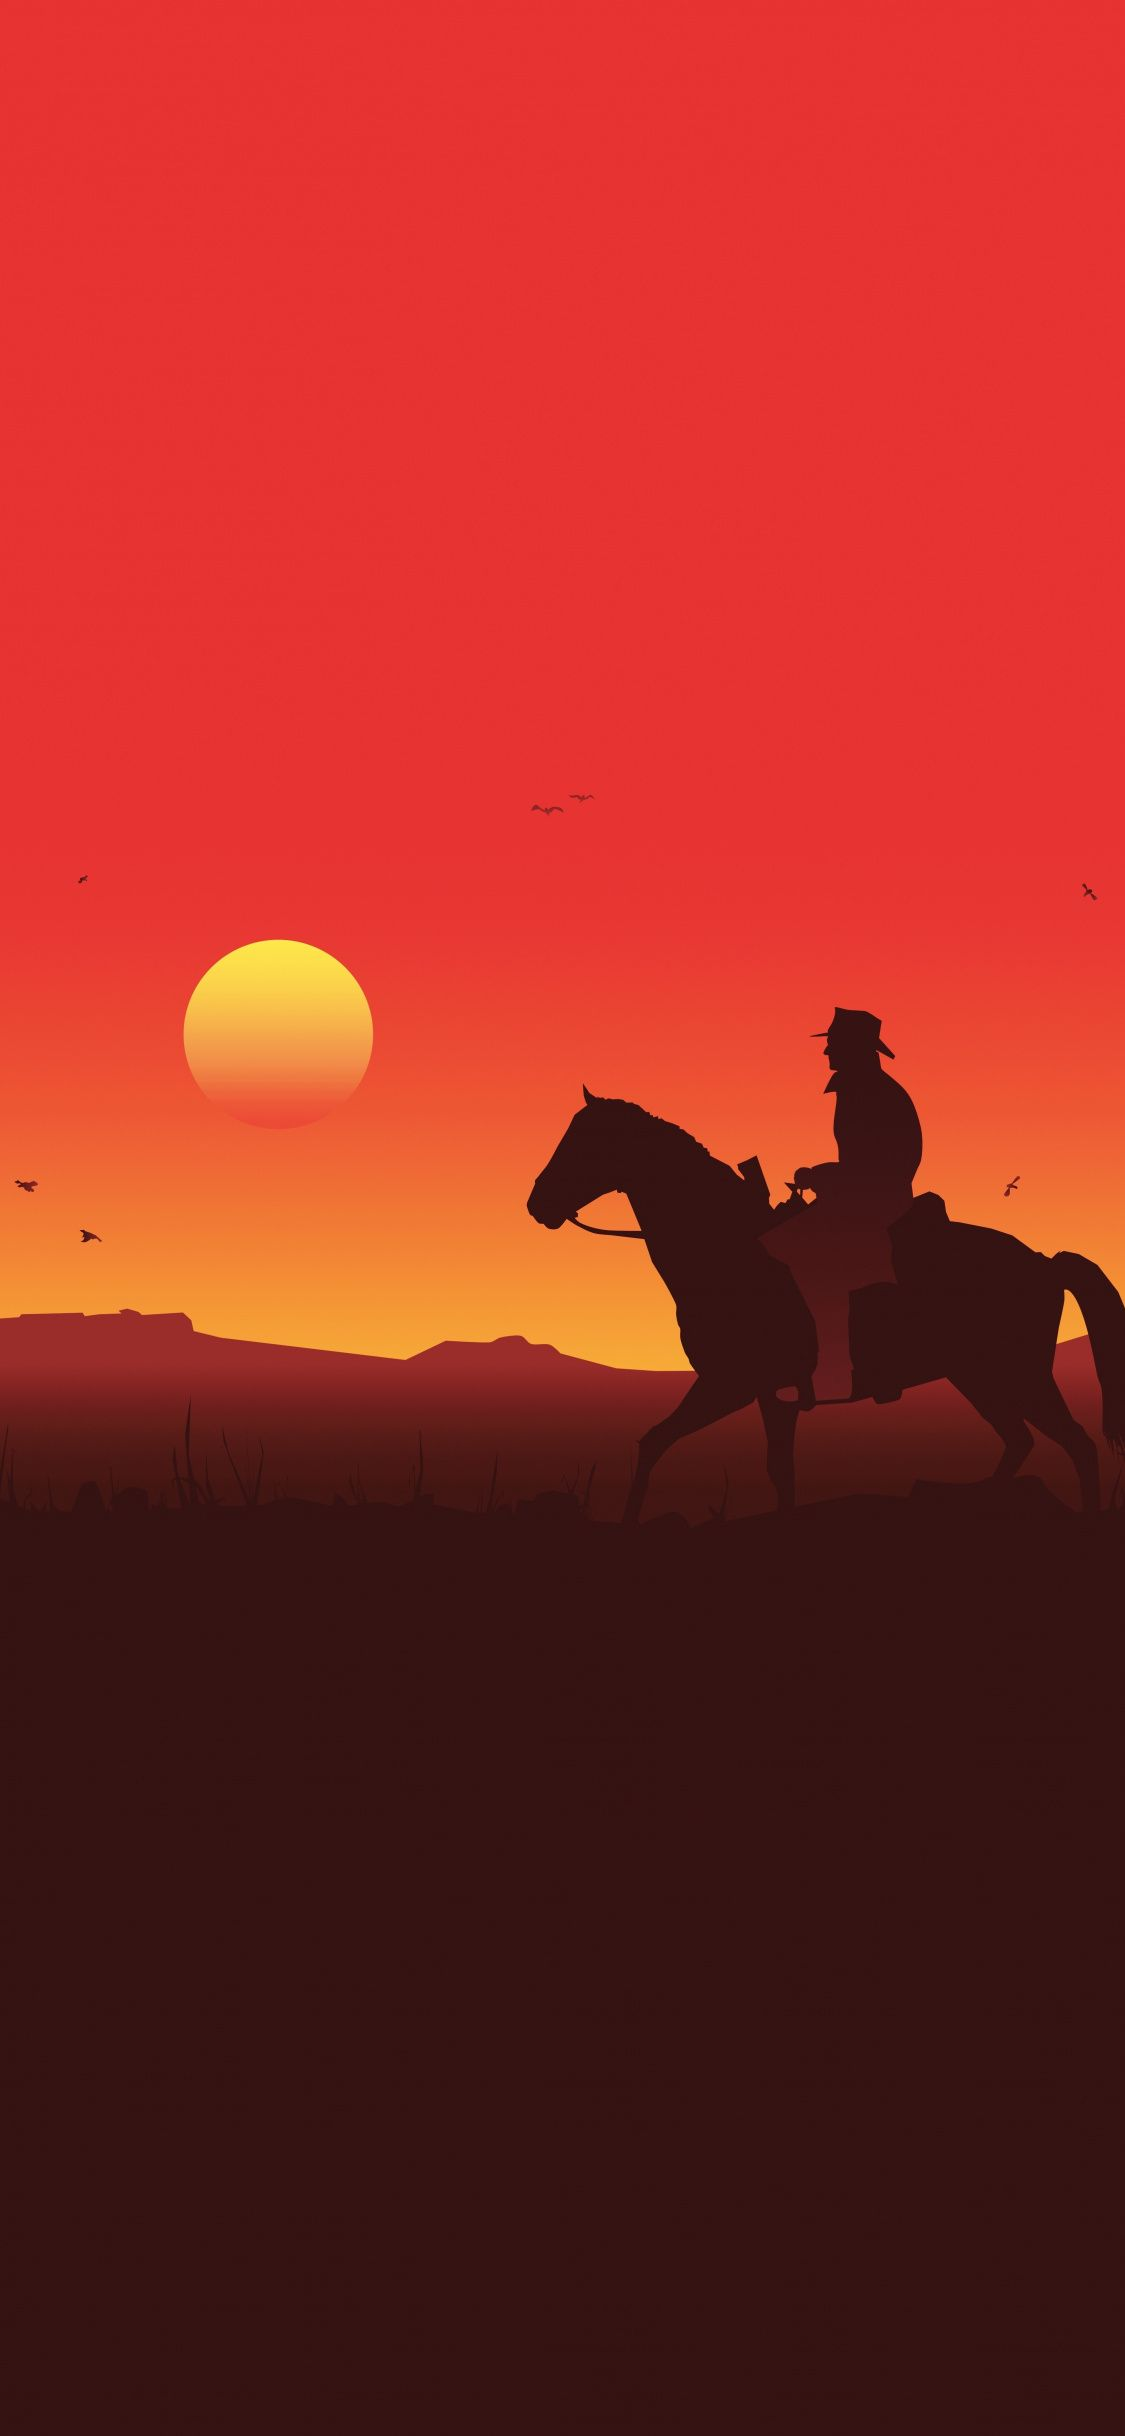 High Resolution Red Dead Redemption 2 Wallpaper 4k Resolution Wallpaper In 2020 Red Dead Redemption Widescreen Wallpaper Red Dead Online